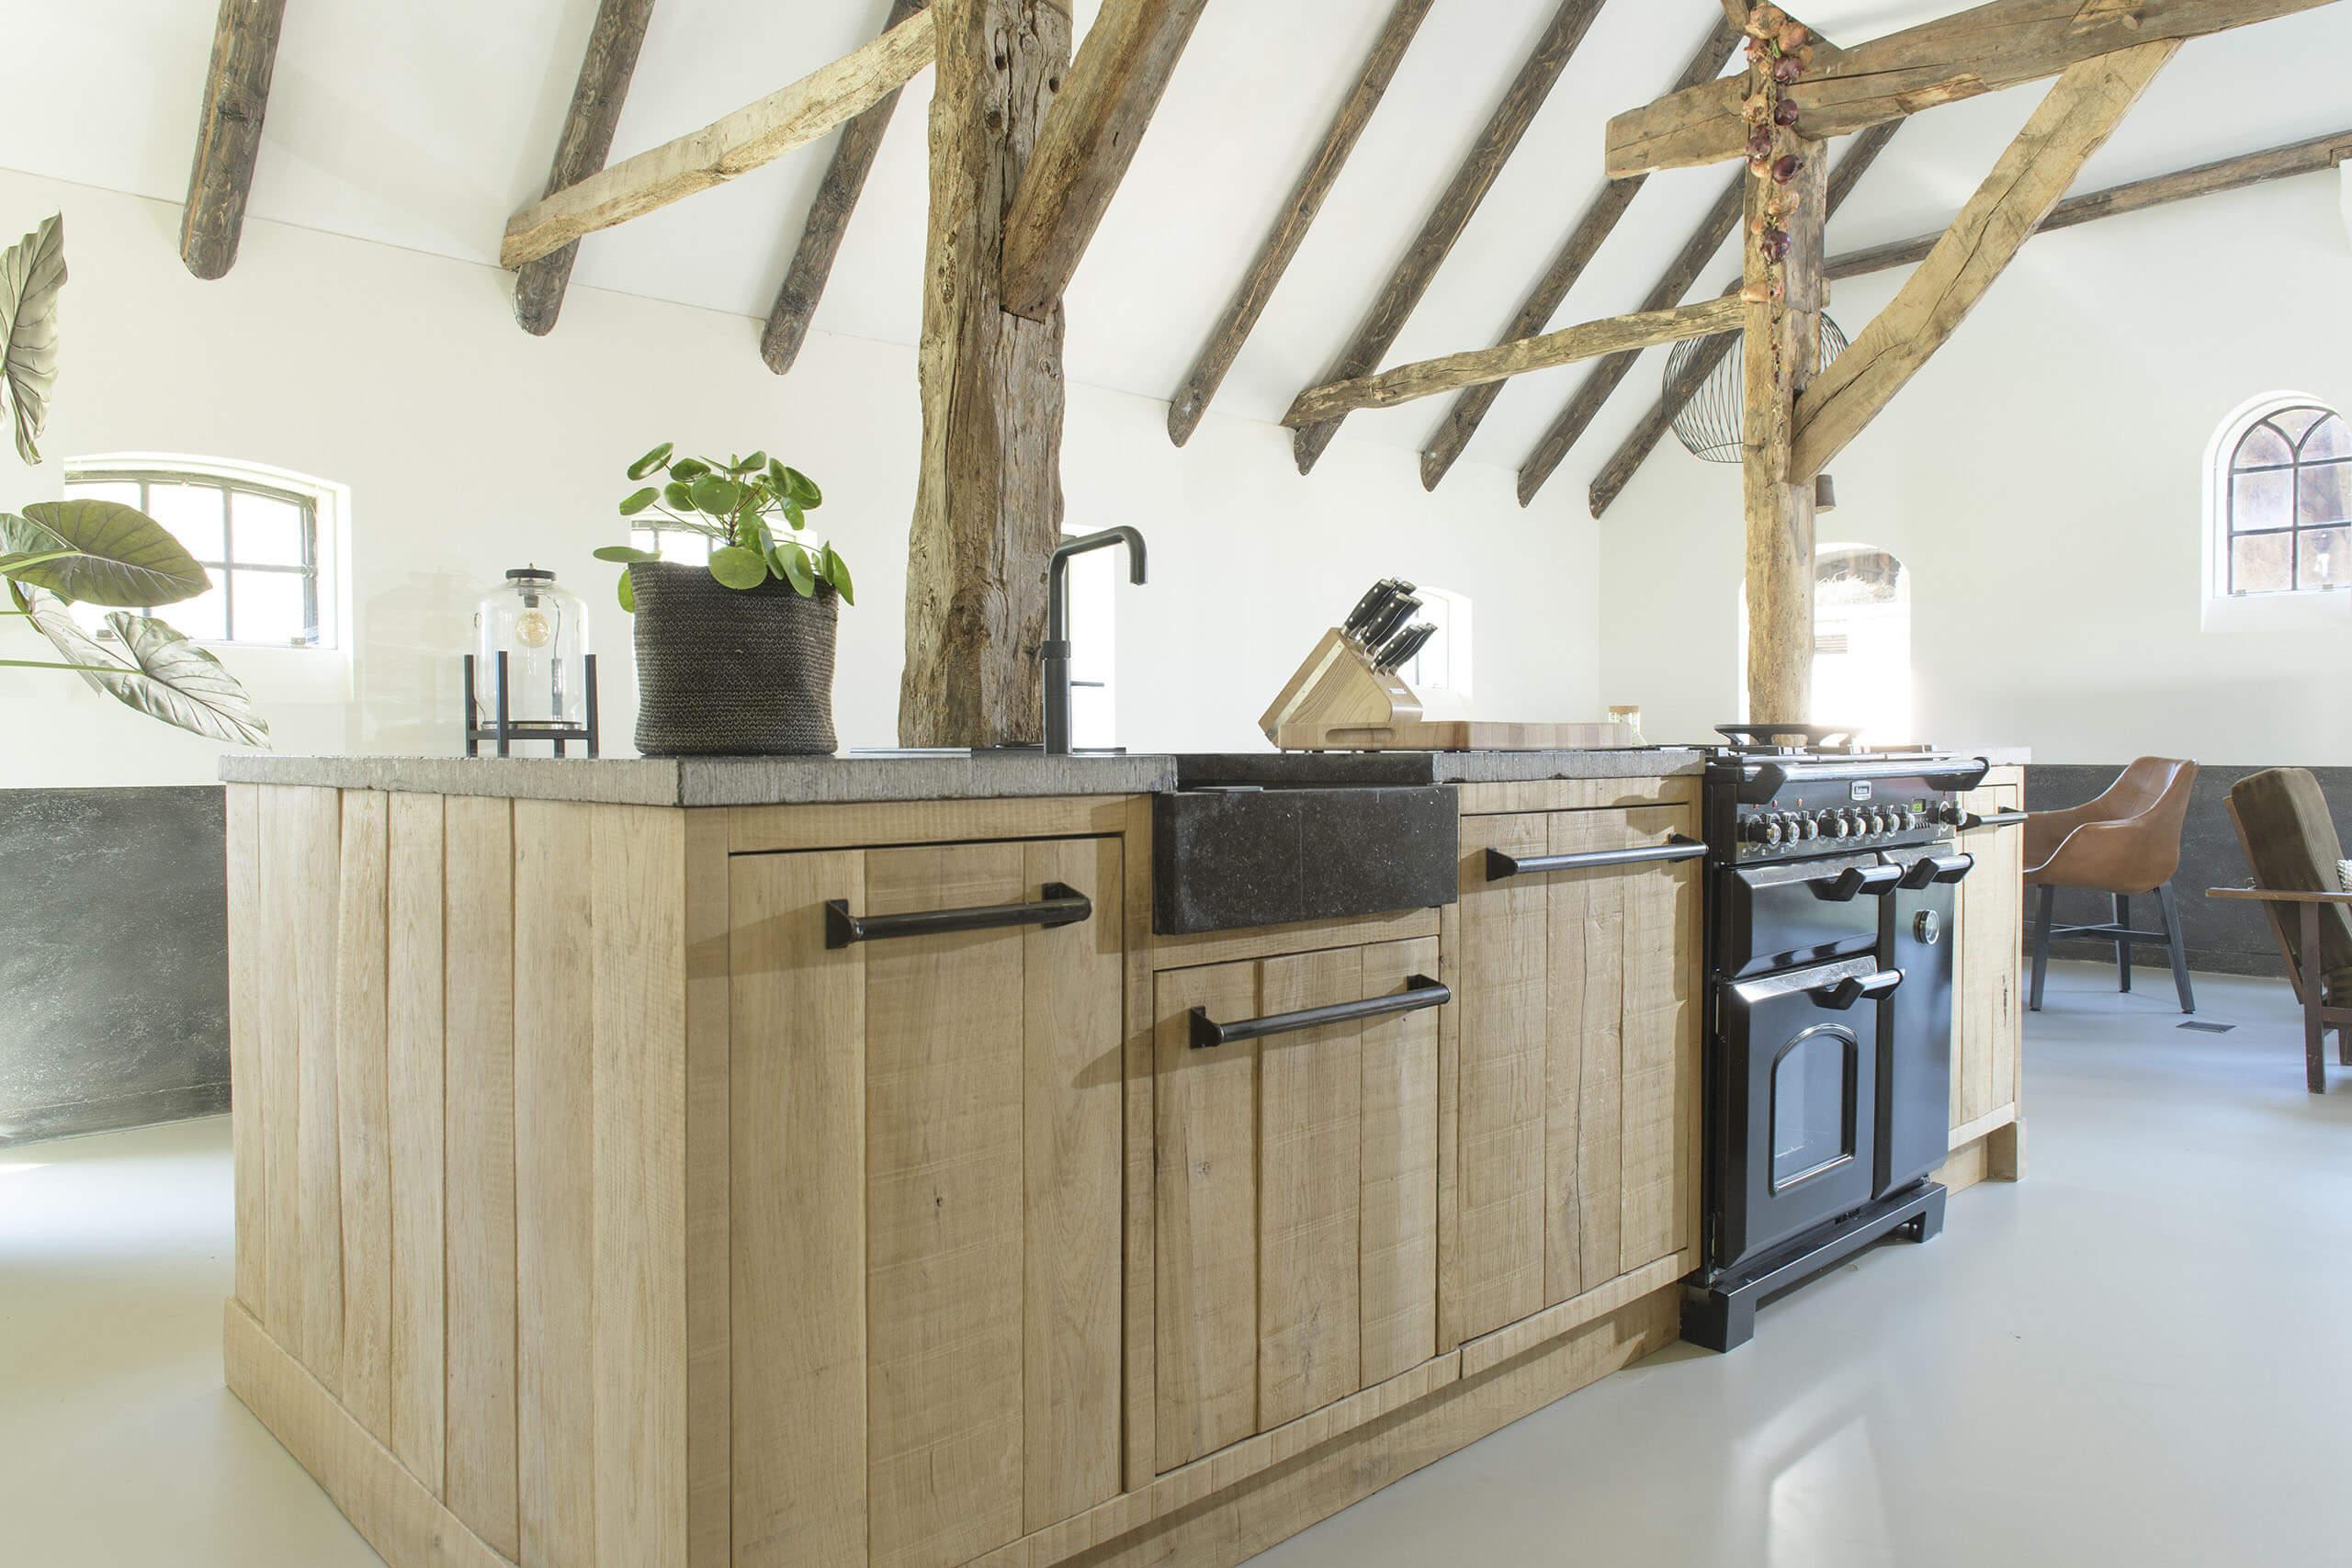 interieurfotografie landelijke keuken masief eiken